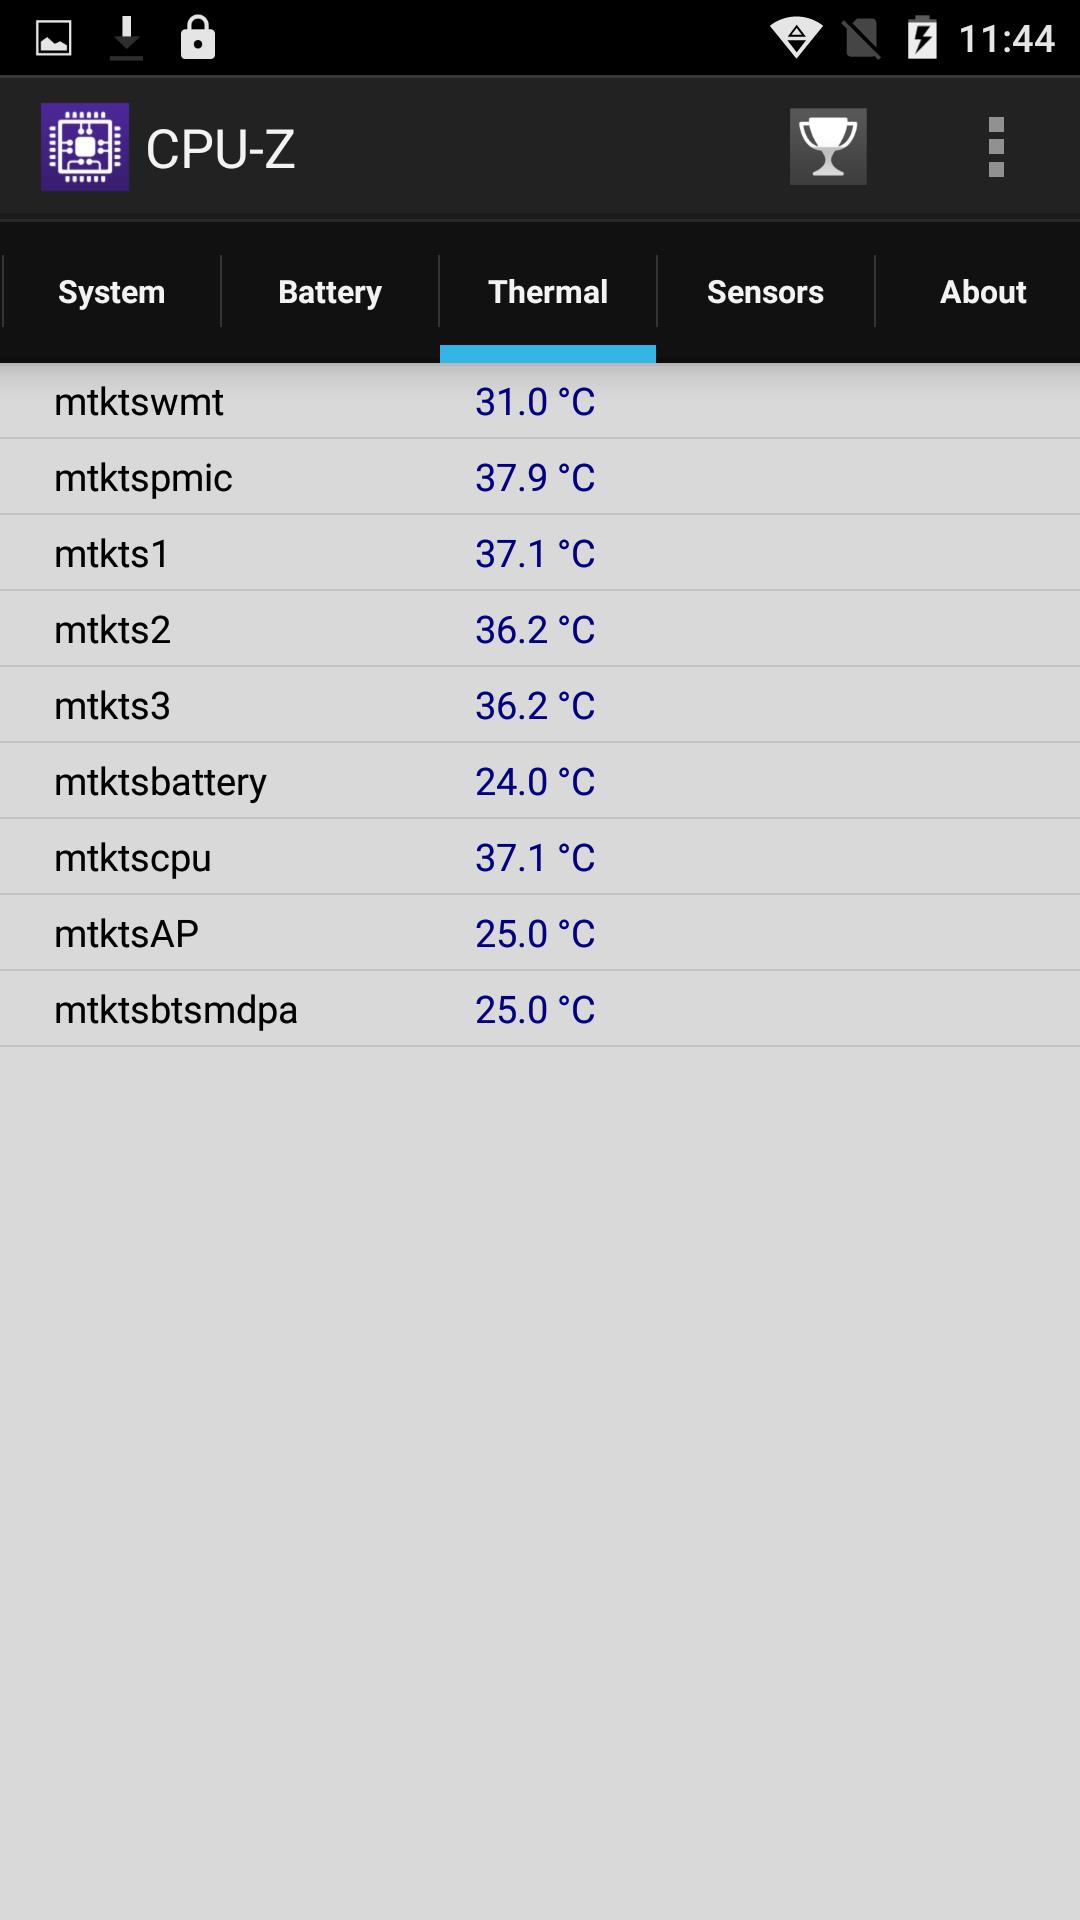 screenshot_2016-01-15-11-44-52